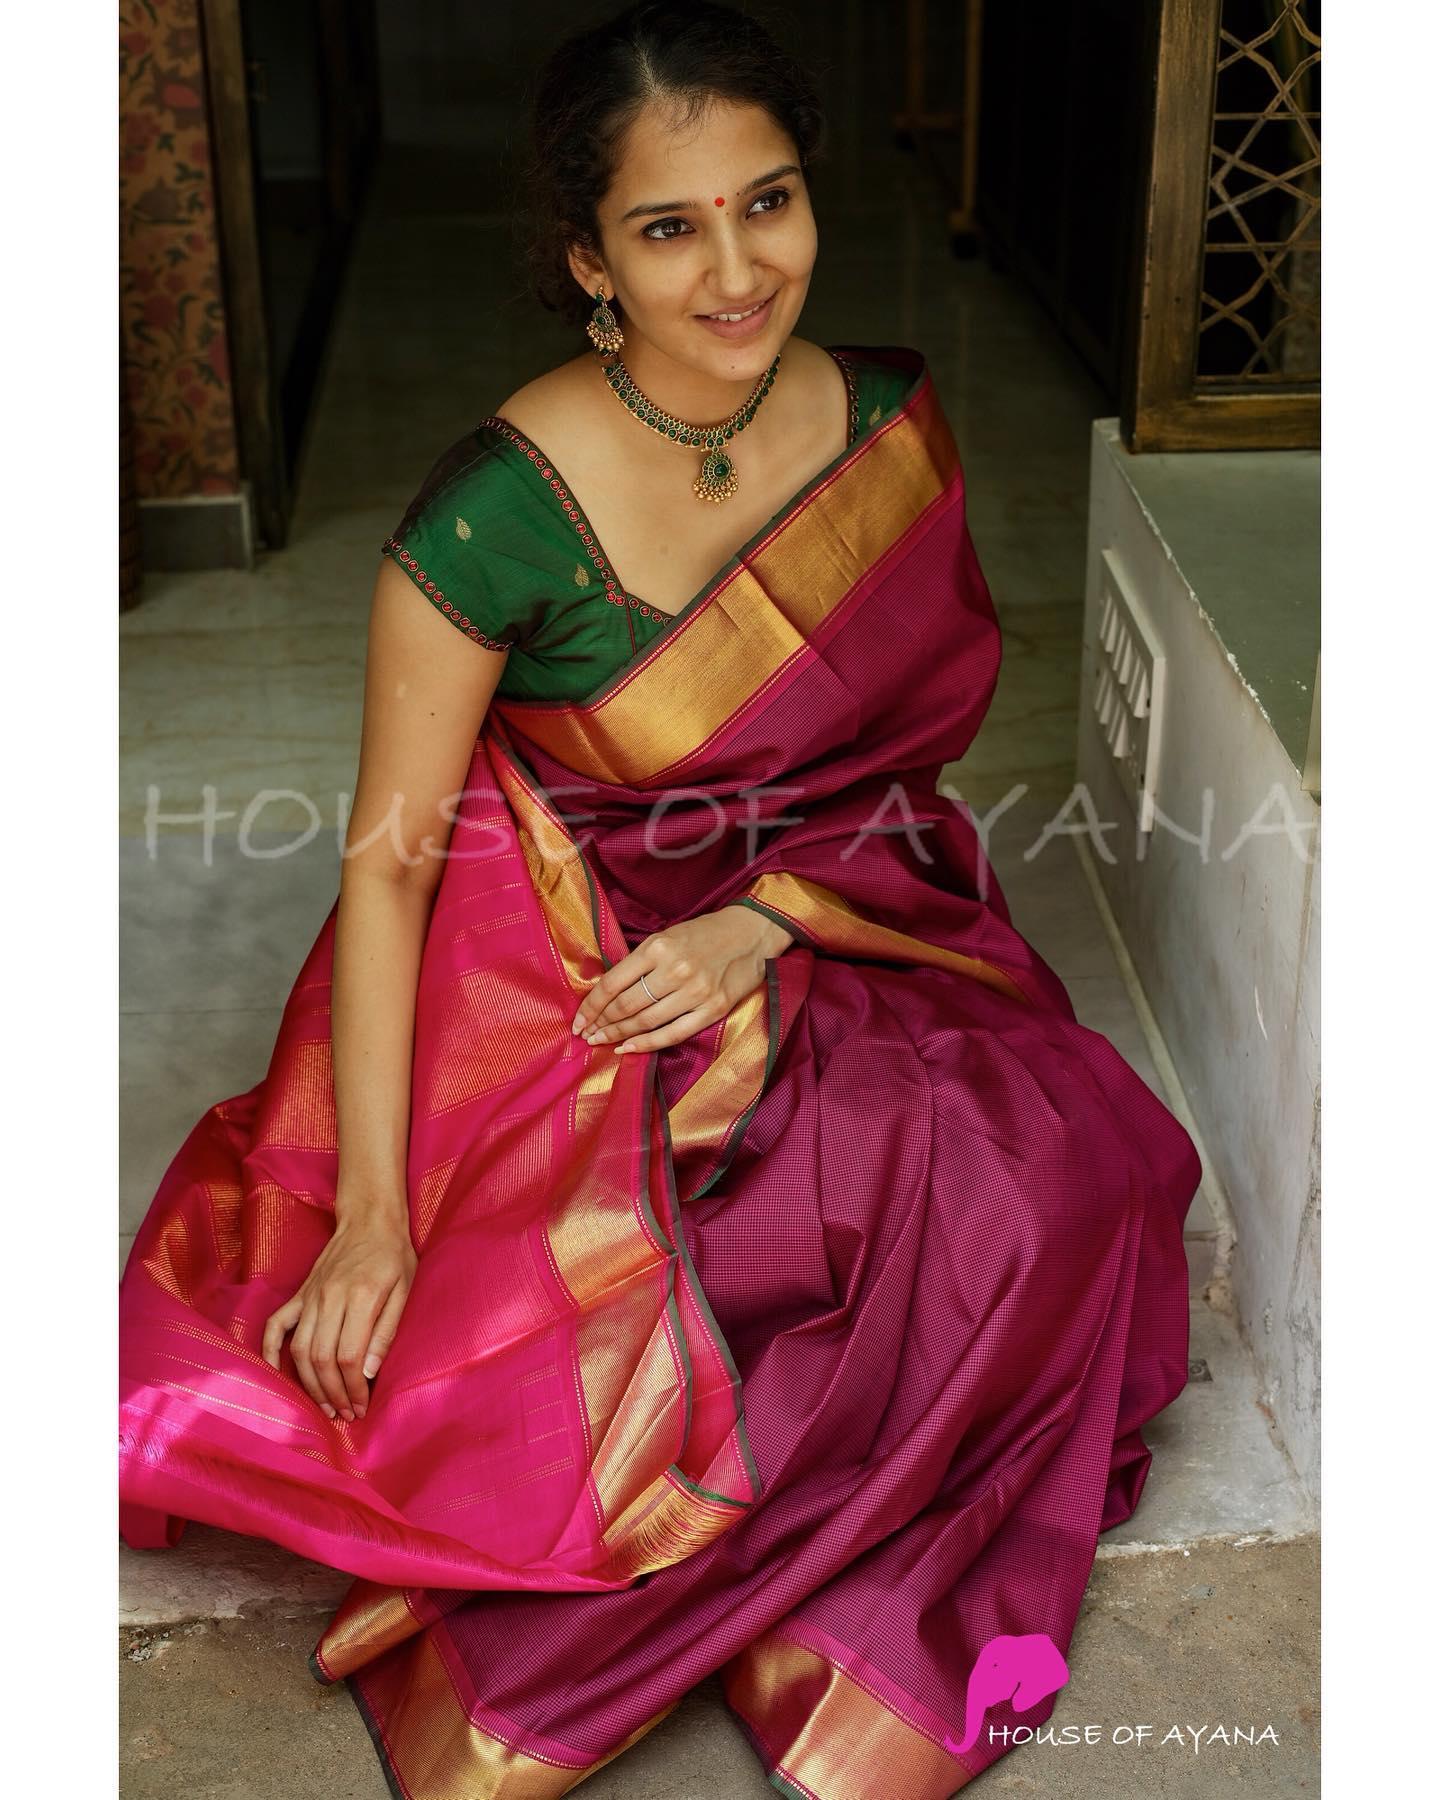 Saree: Kanjivaram pure silk handwoven with contrast borders and podi kattam all over. Blouse: Pink silk blouse with coordinated borders (as shown in last image) . 2021-07-27